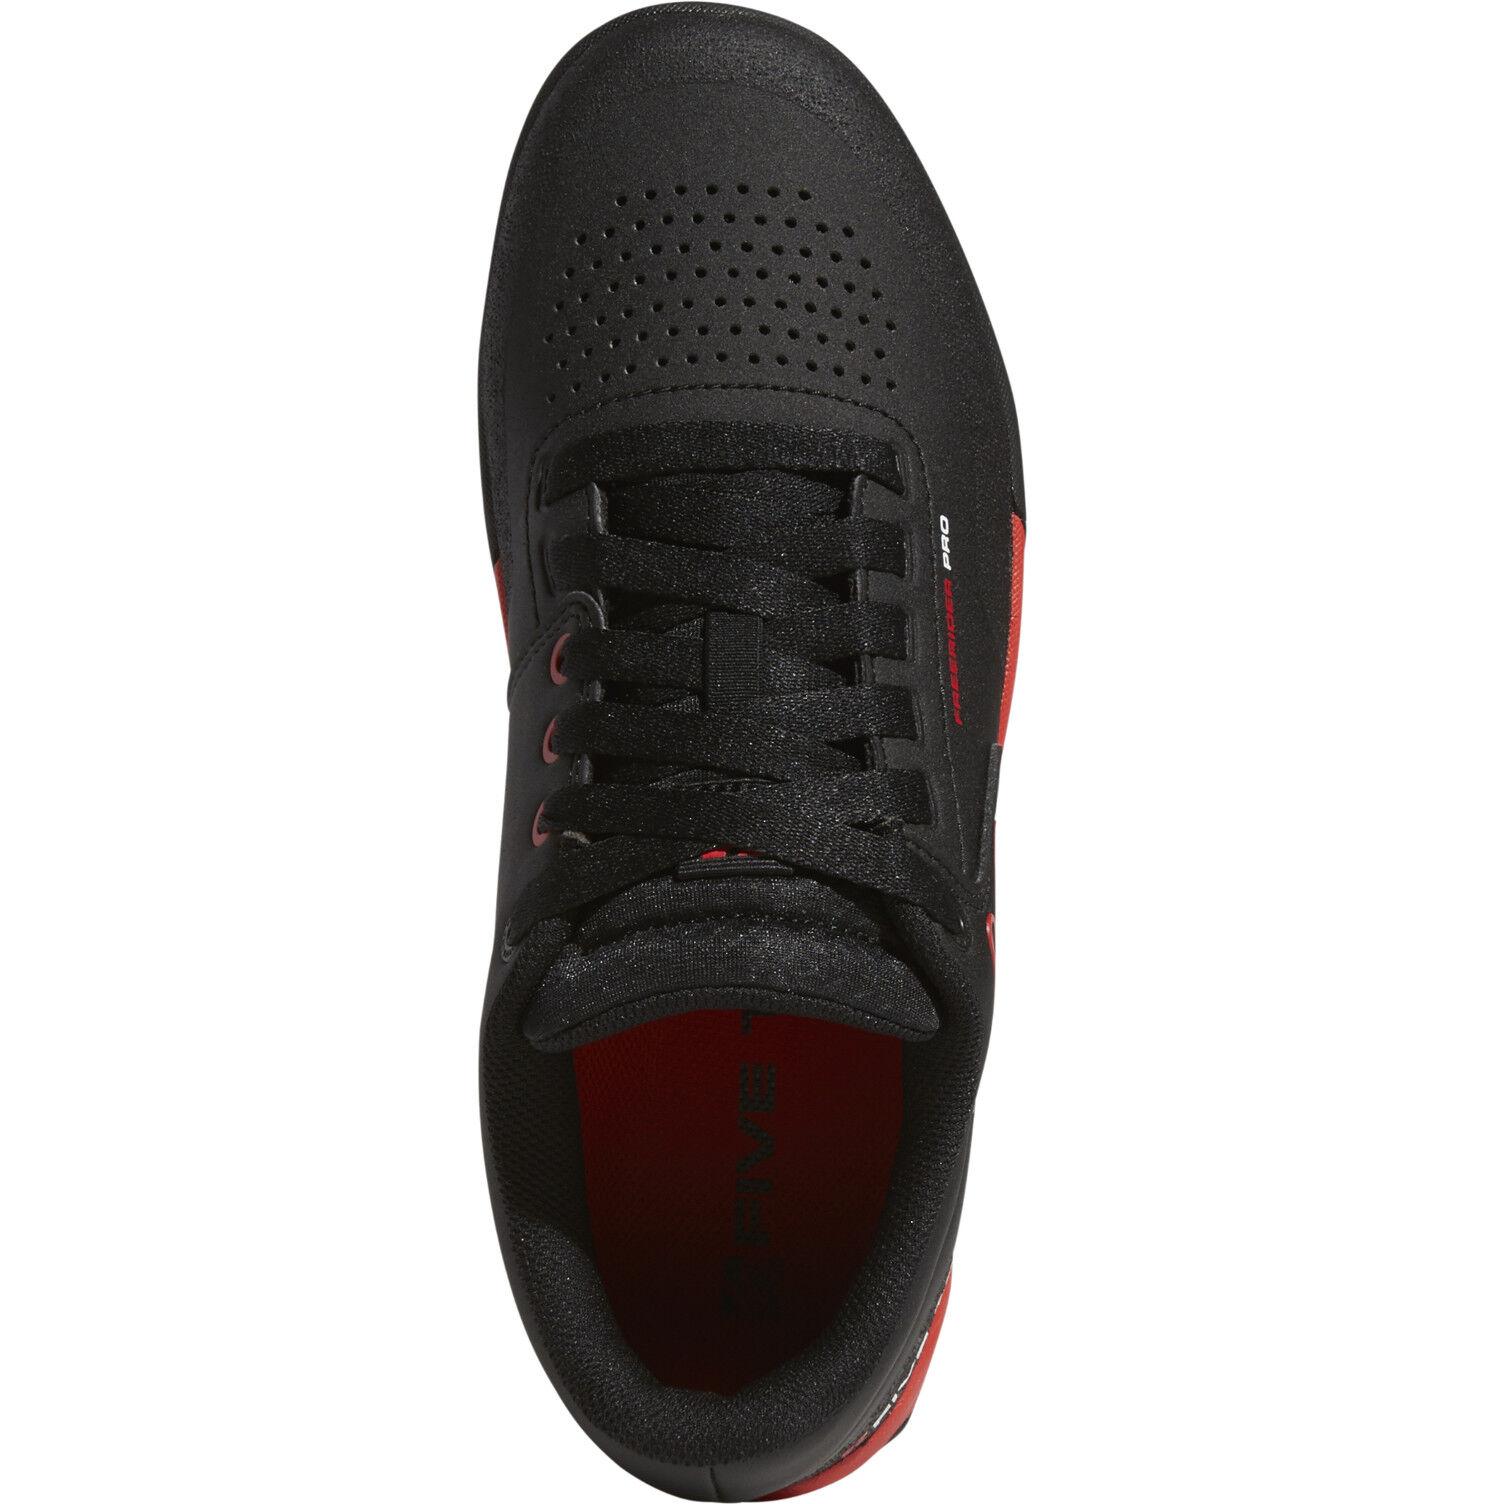 adidas Five Ten Freerider Pro Shoes Herren core blackredftwr white